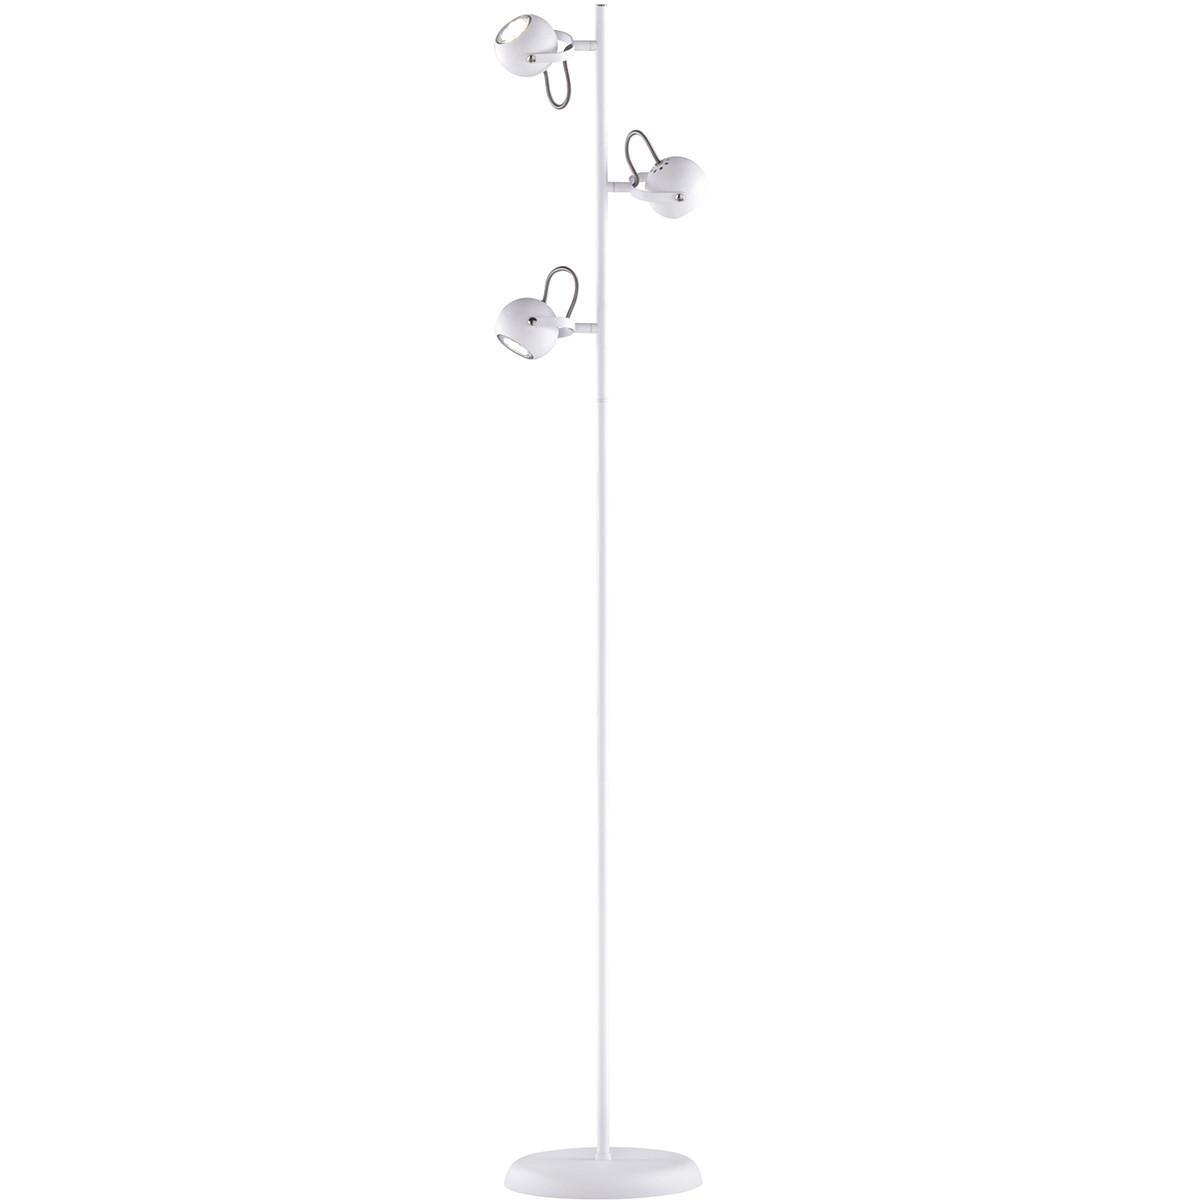 LED Vloerlamp - Trion Bosty - GU10 Fitting - 3-lichts - Rond - Mat Wit - Aluminium